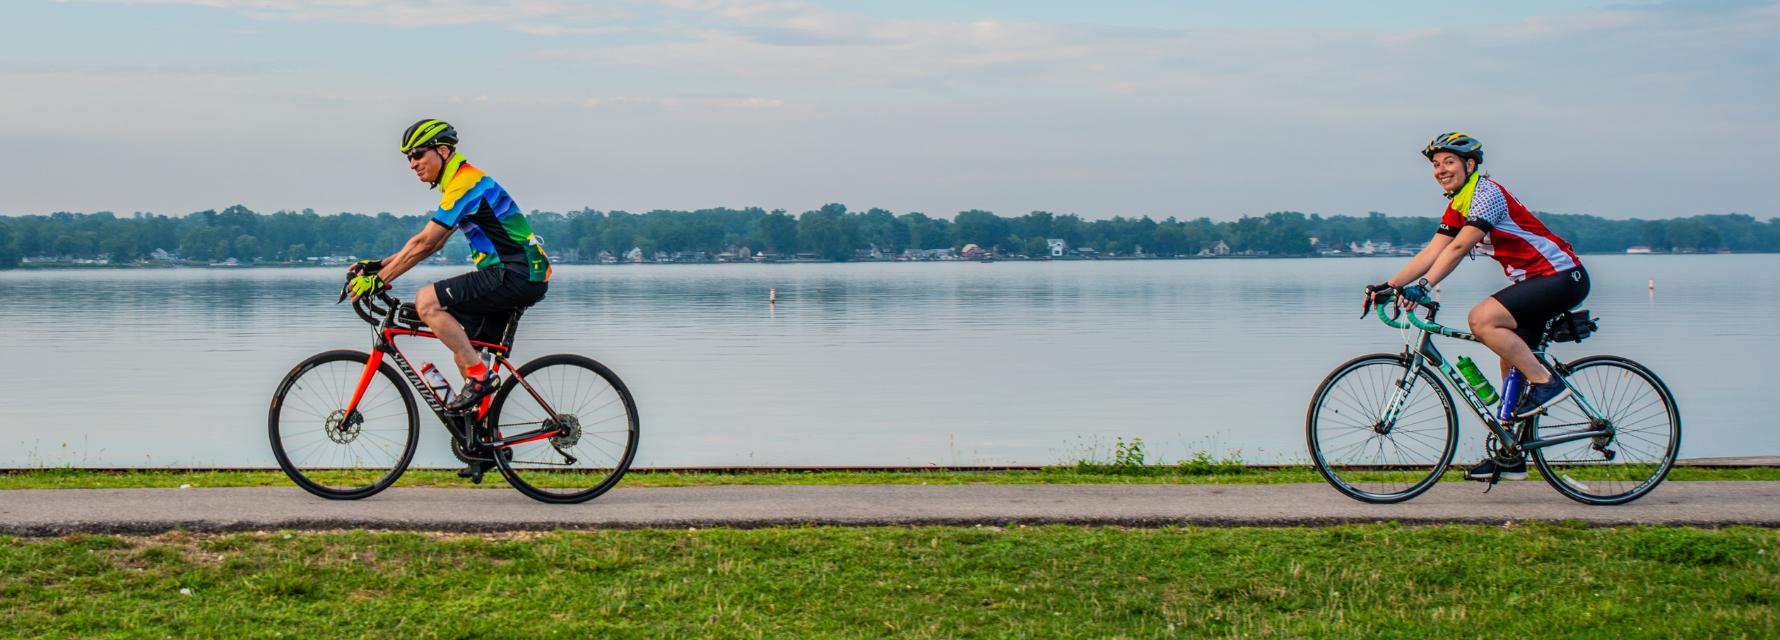 2 cyclists